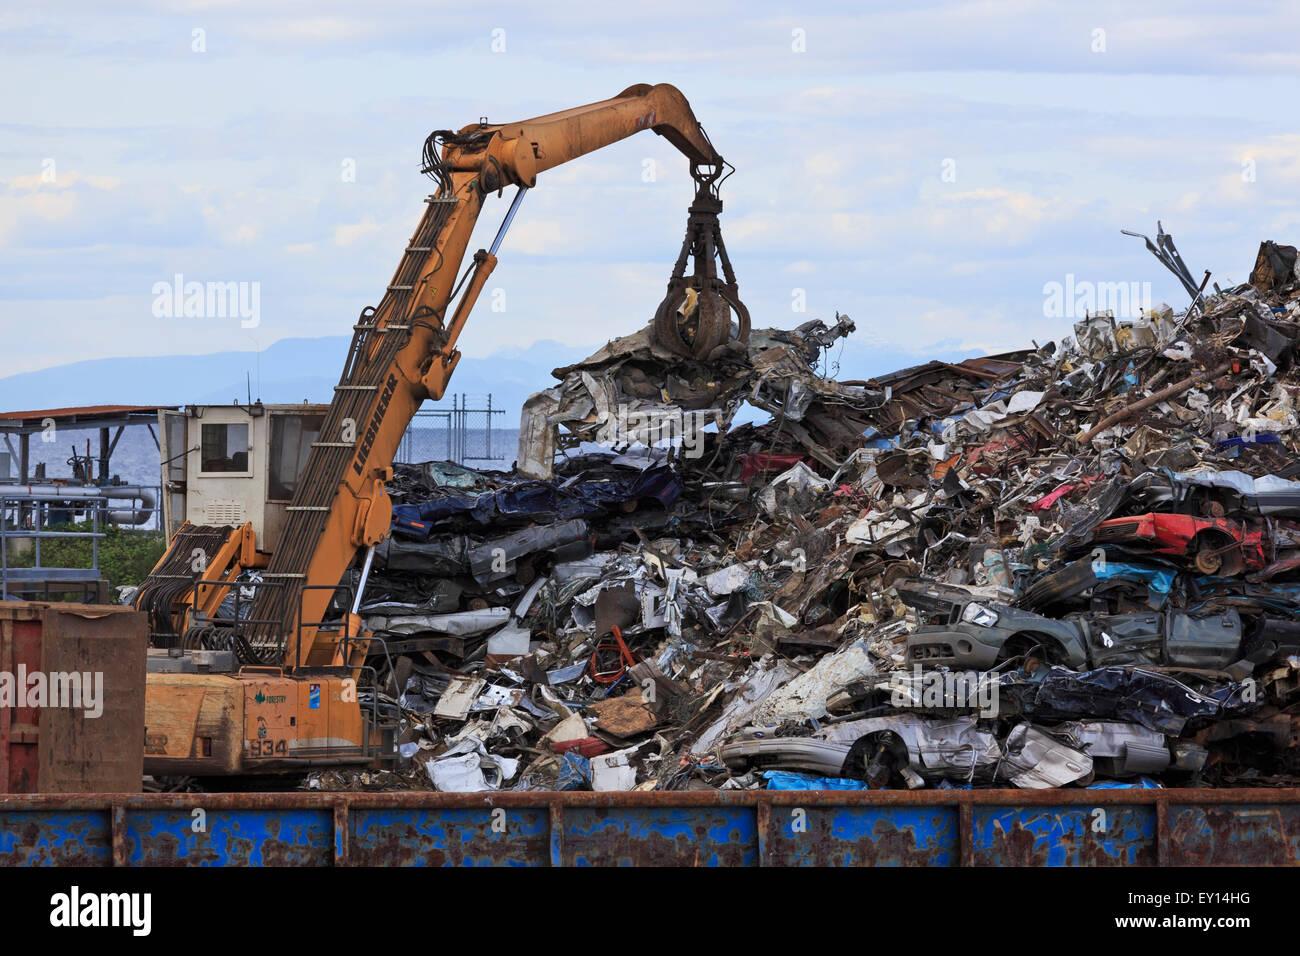 Machine loading scrap metal onto barge, Duke Point, Vancouver Island, British Columbia - Stock Image